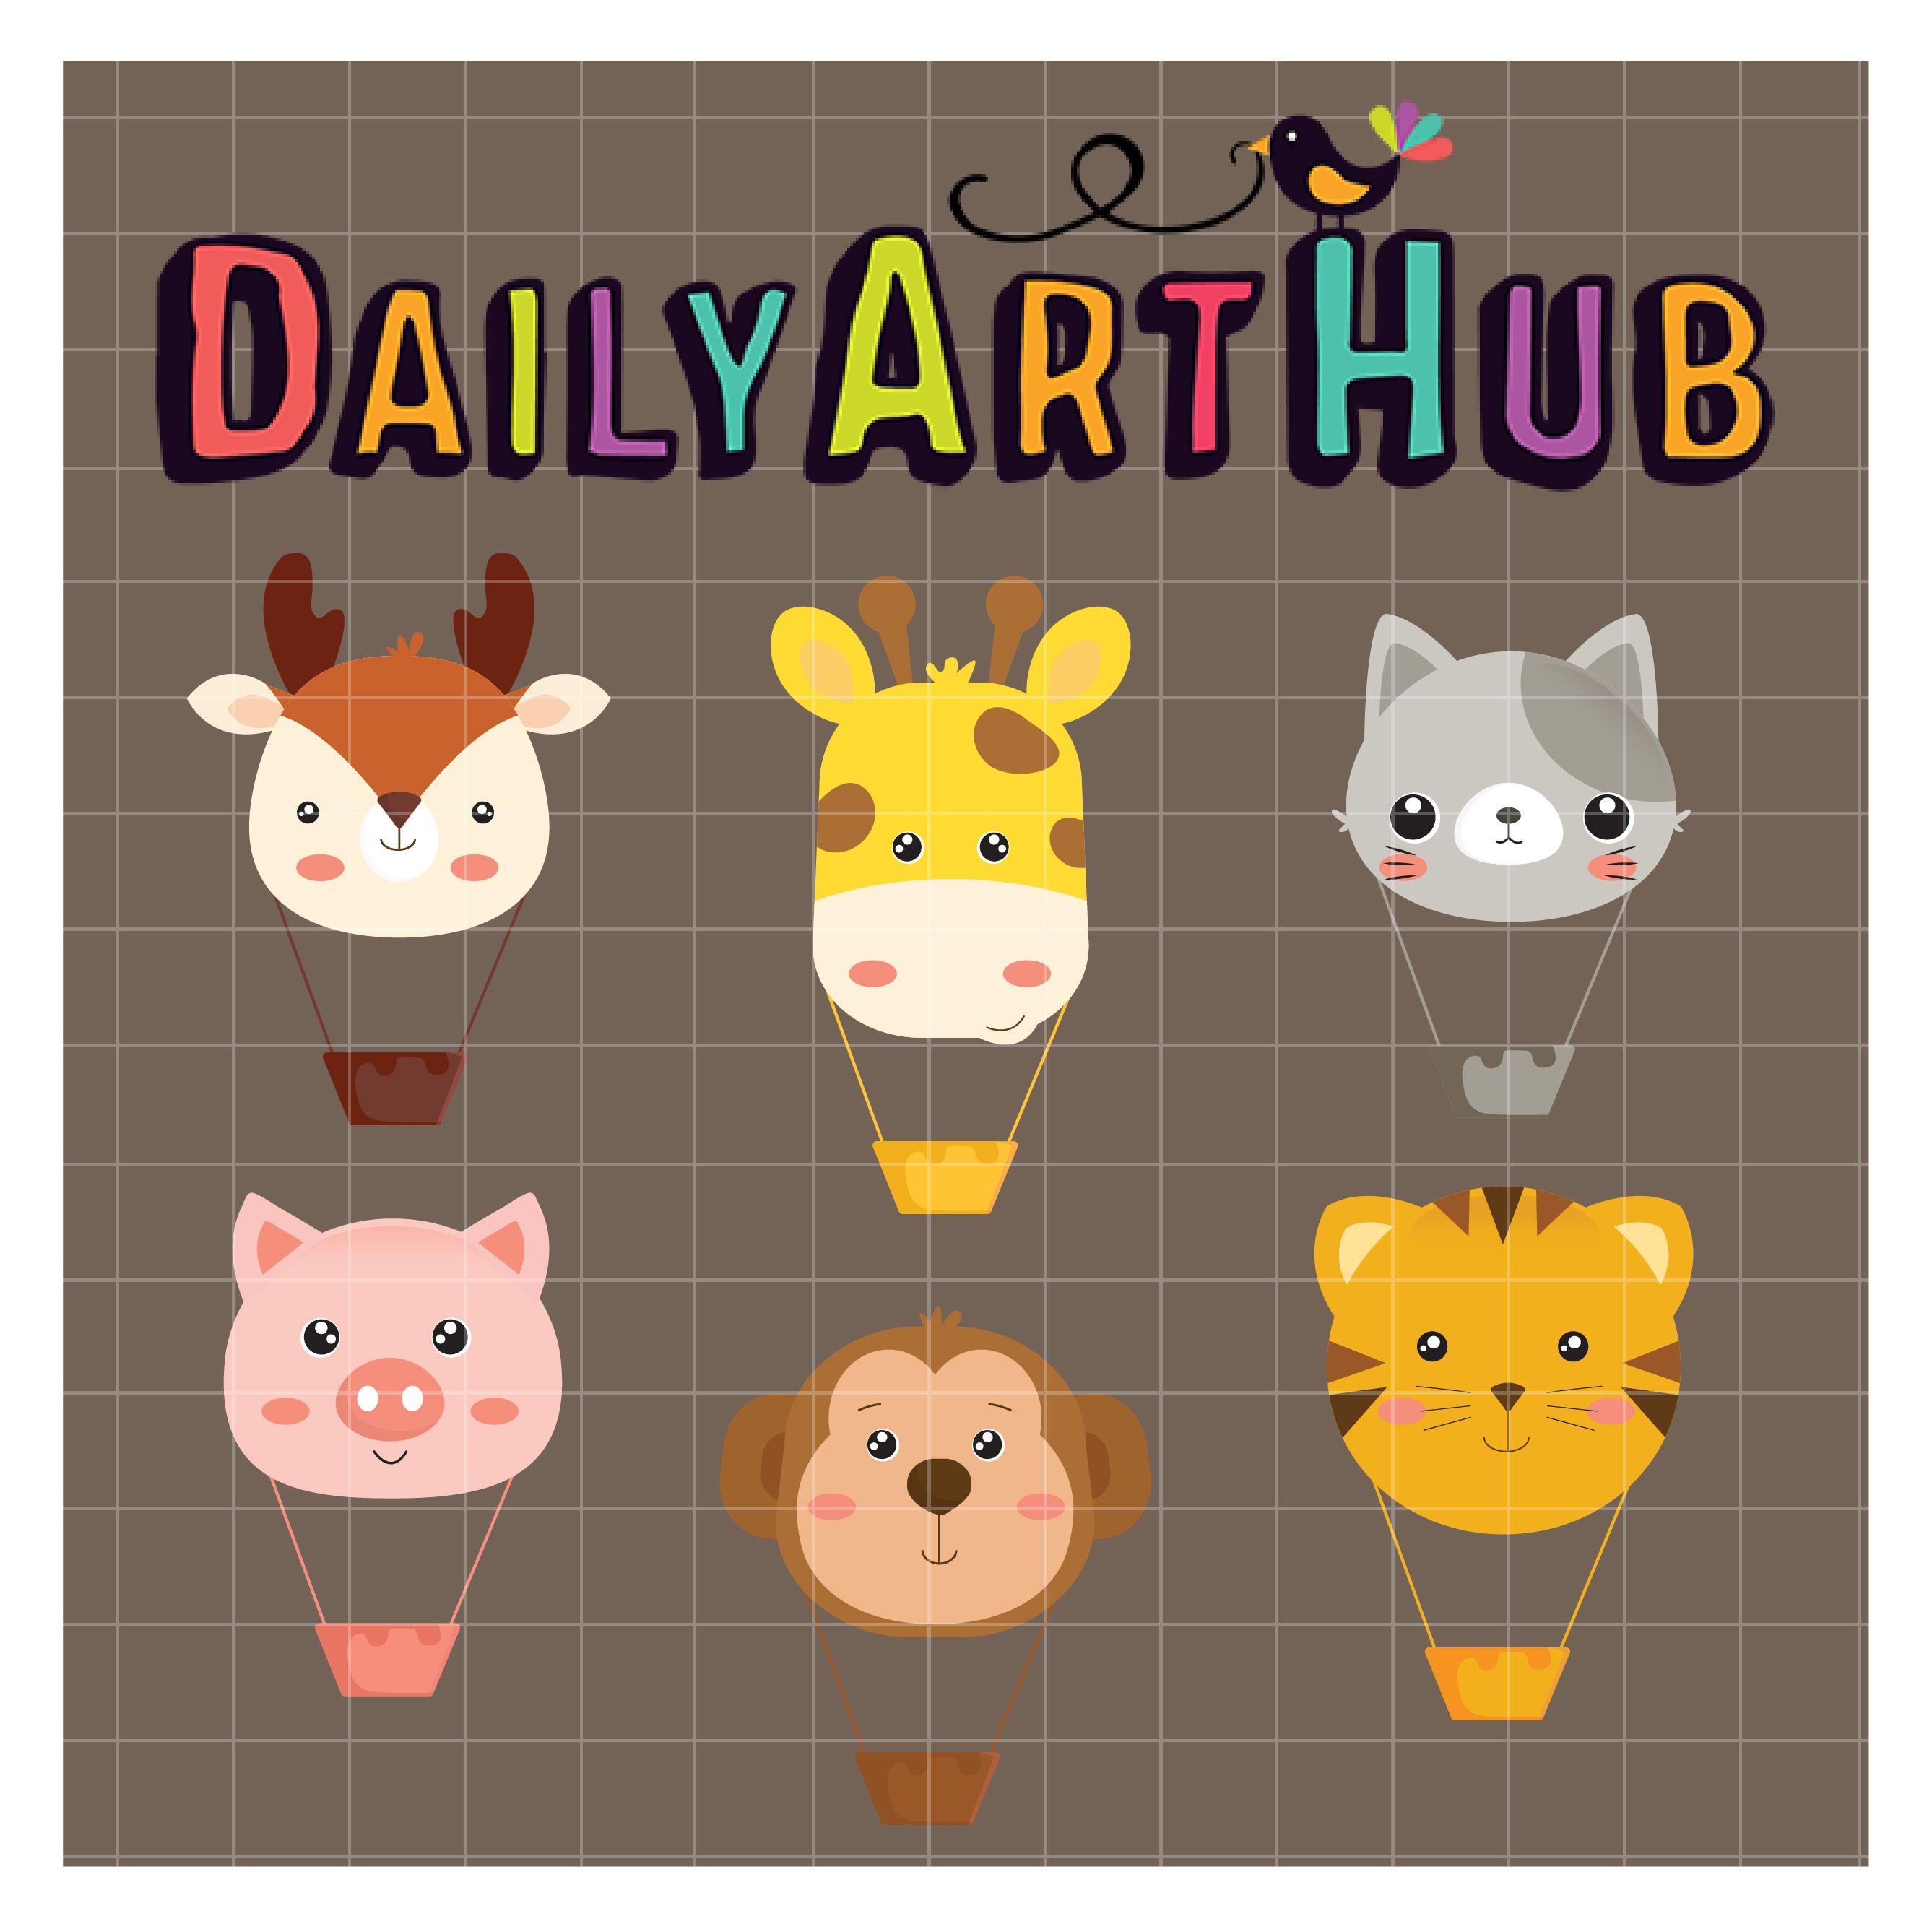 Hot Air Balloons Animals Clip Art Set Daily Art Hub Free Clip Art Everyday Animals Clip Art Balloon Animals Art Hub